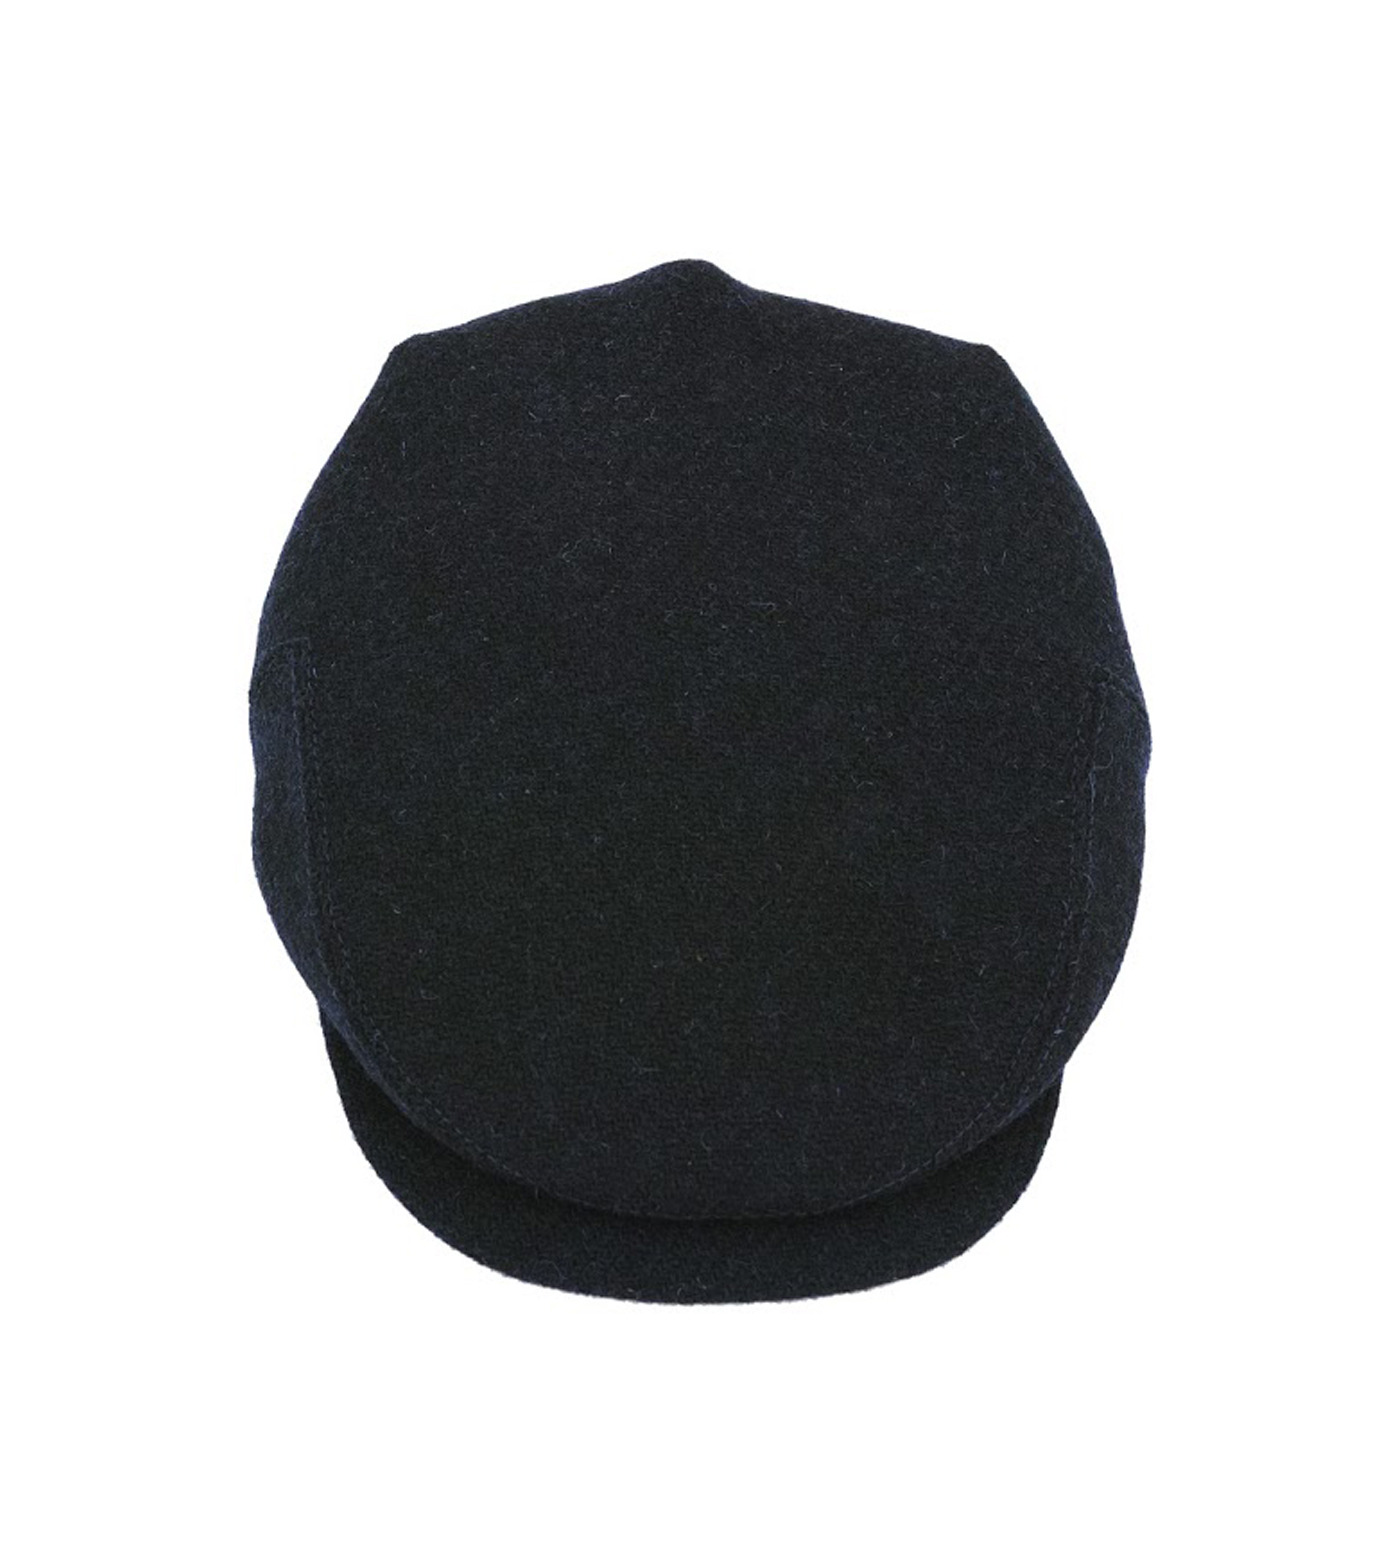 Richardson Magazine(リチャードソン マガジン)のHarris Tweed Flat Cap-NAVY(キャップ/cap)-AW16045-93 拡大詳細画像2